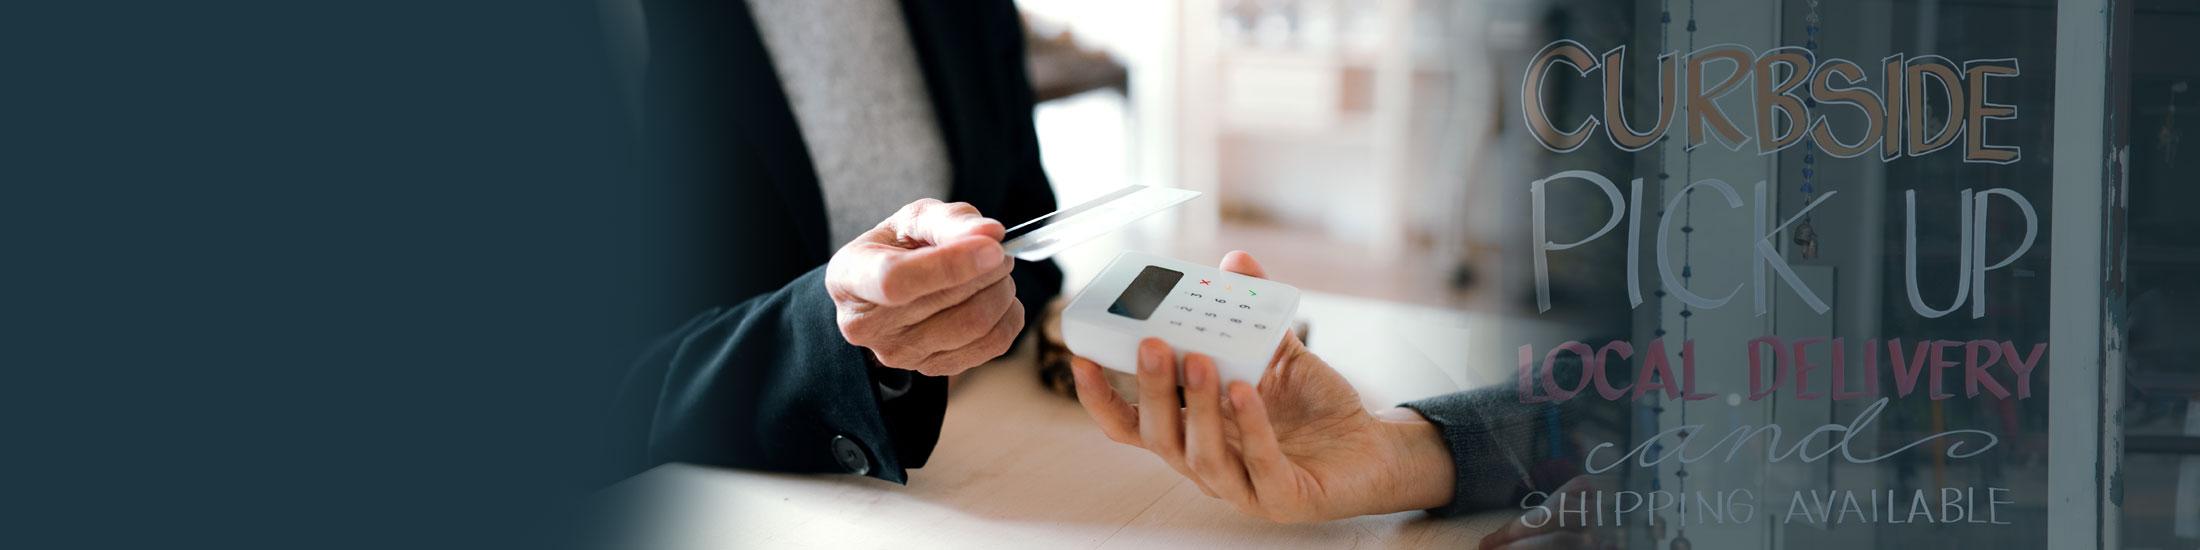 E-Commerce Sales Settle as Stores Open, BOPIS Still Strong